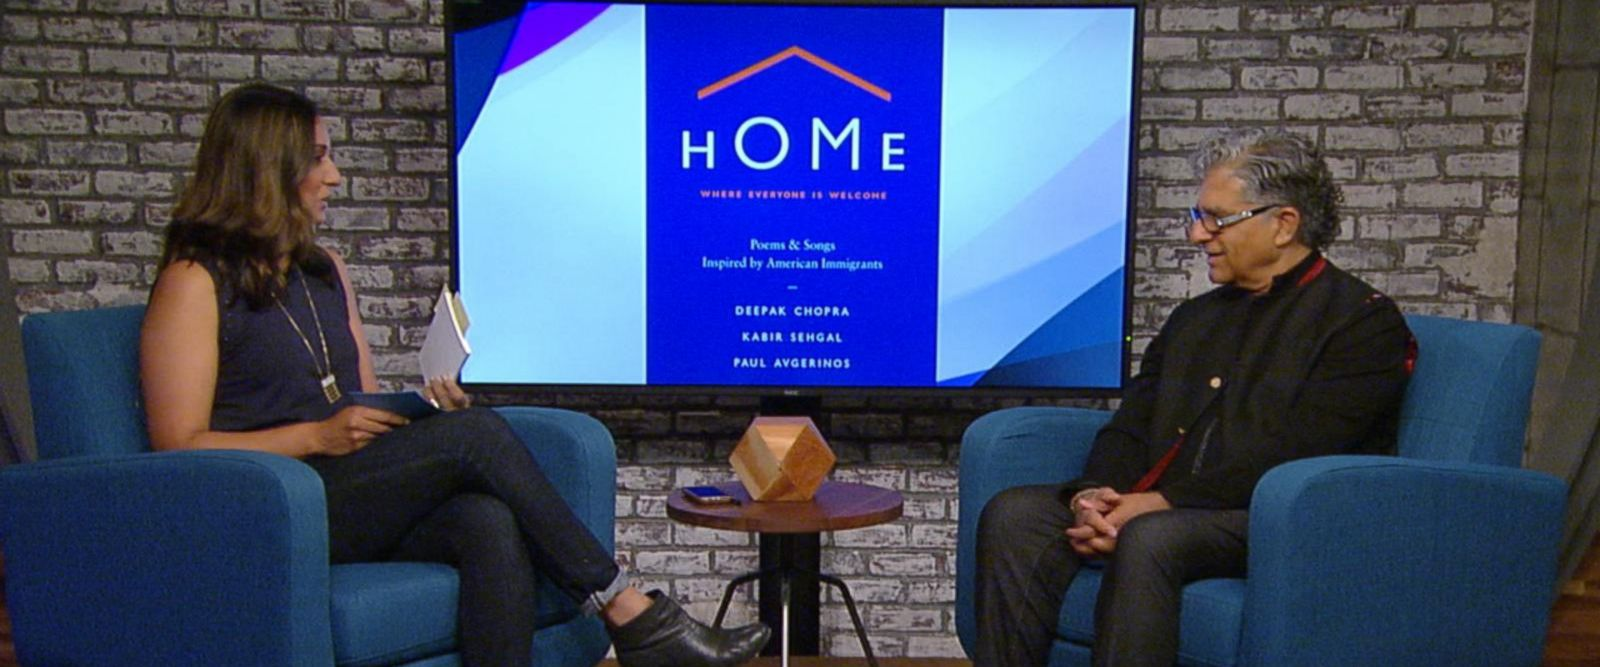 VIDEO: Author Deepak Chopra discusses his new book 'Home.'